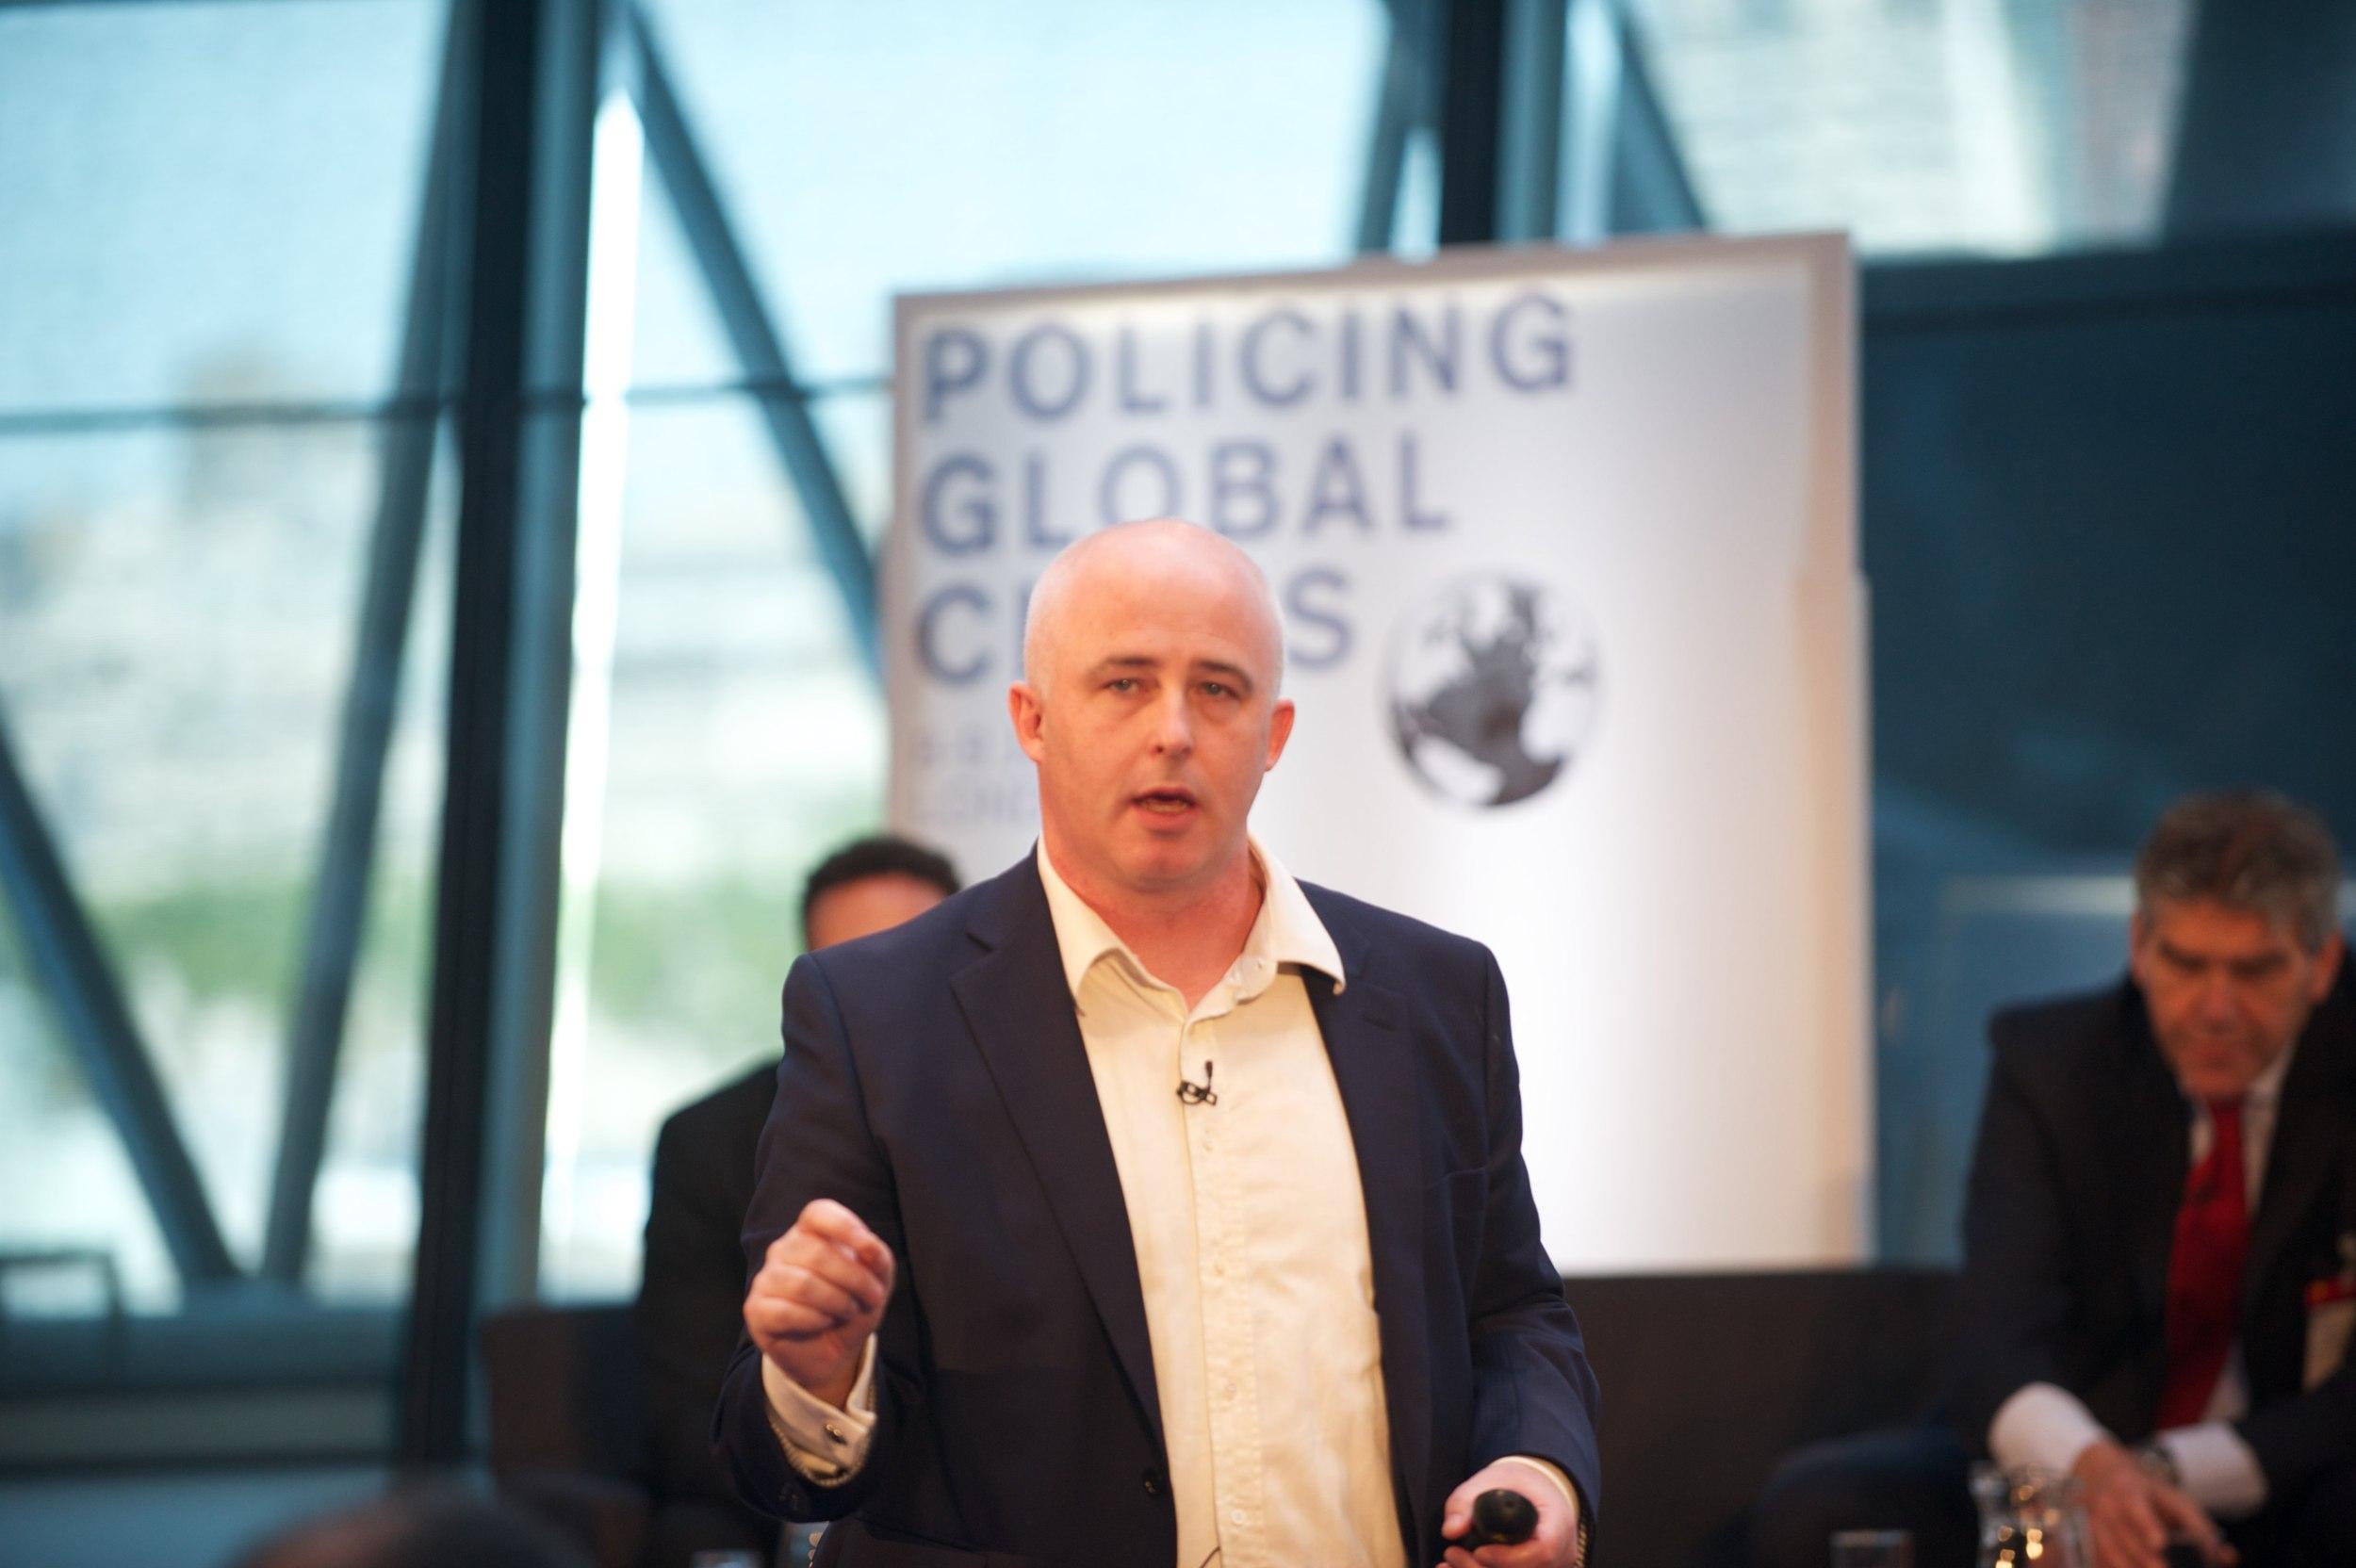 Global Policing 2013